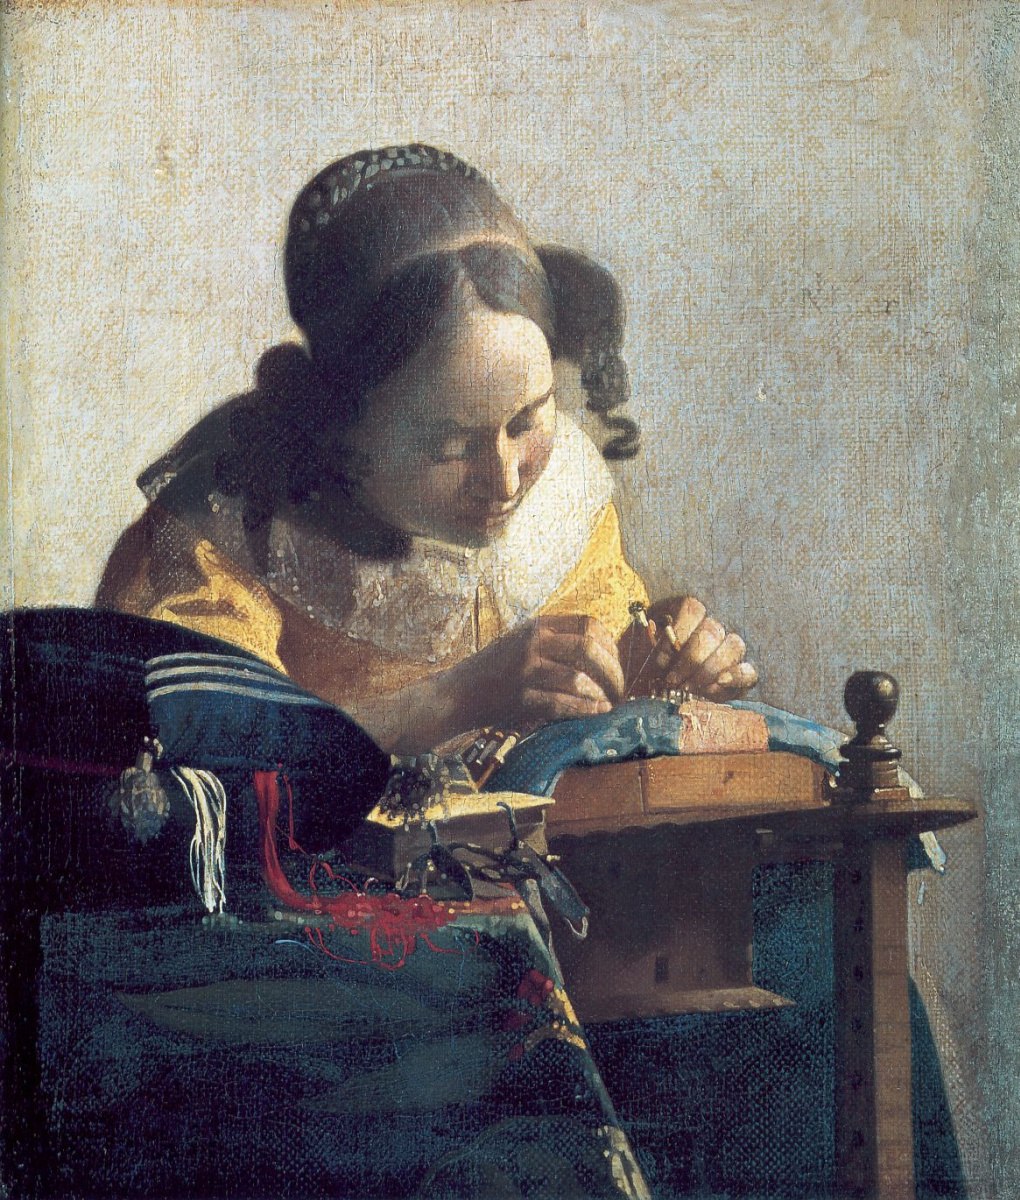 Jan Vermeer. The Lacemaker